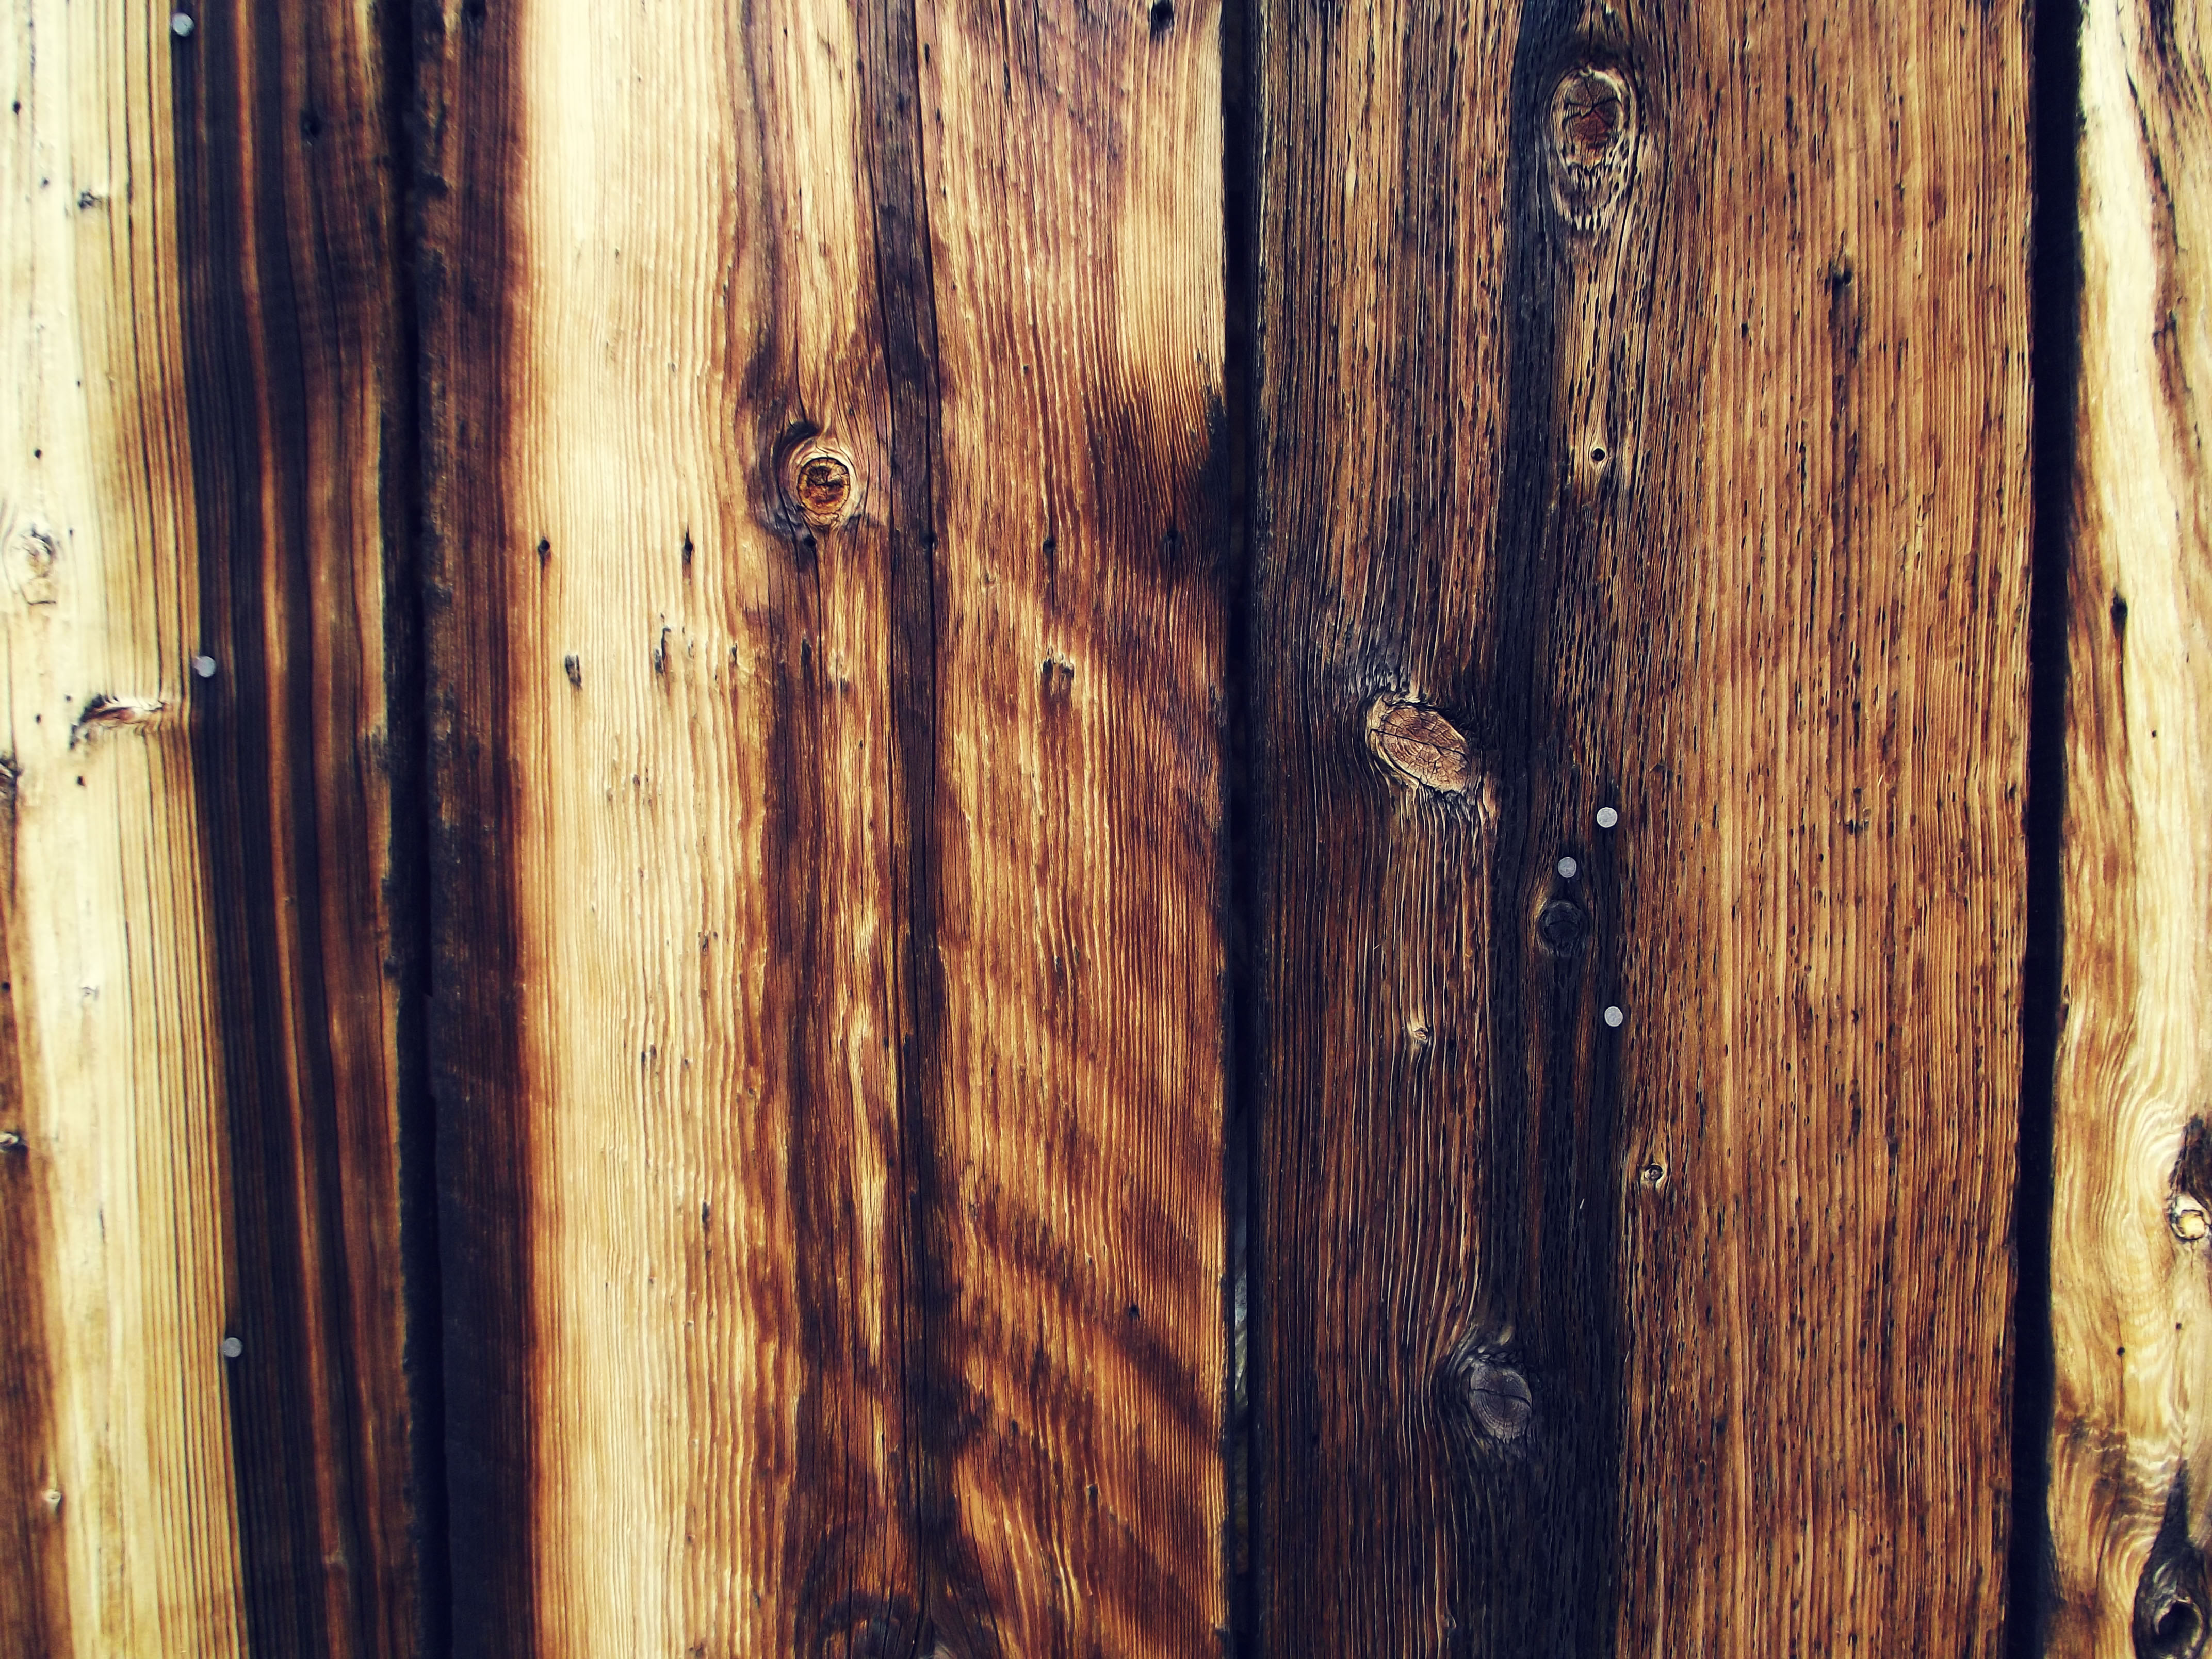 Barn wood look wallpaper wallpapersafari for Where can i buy old barn wood